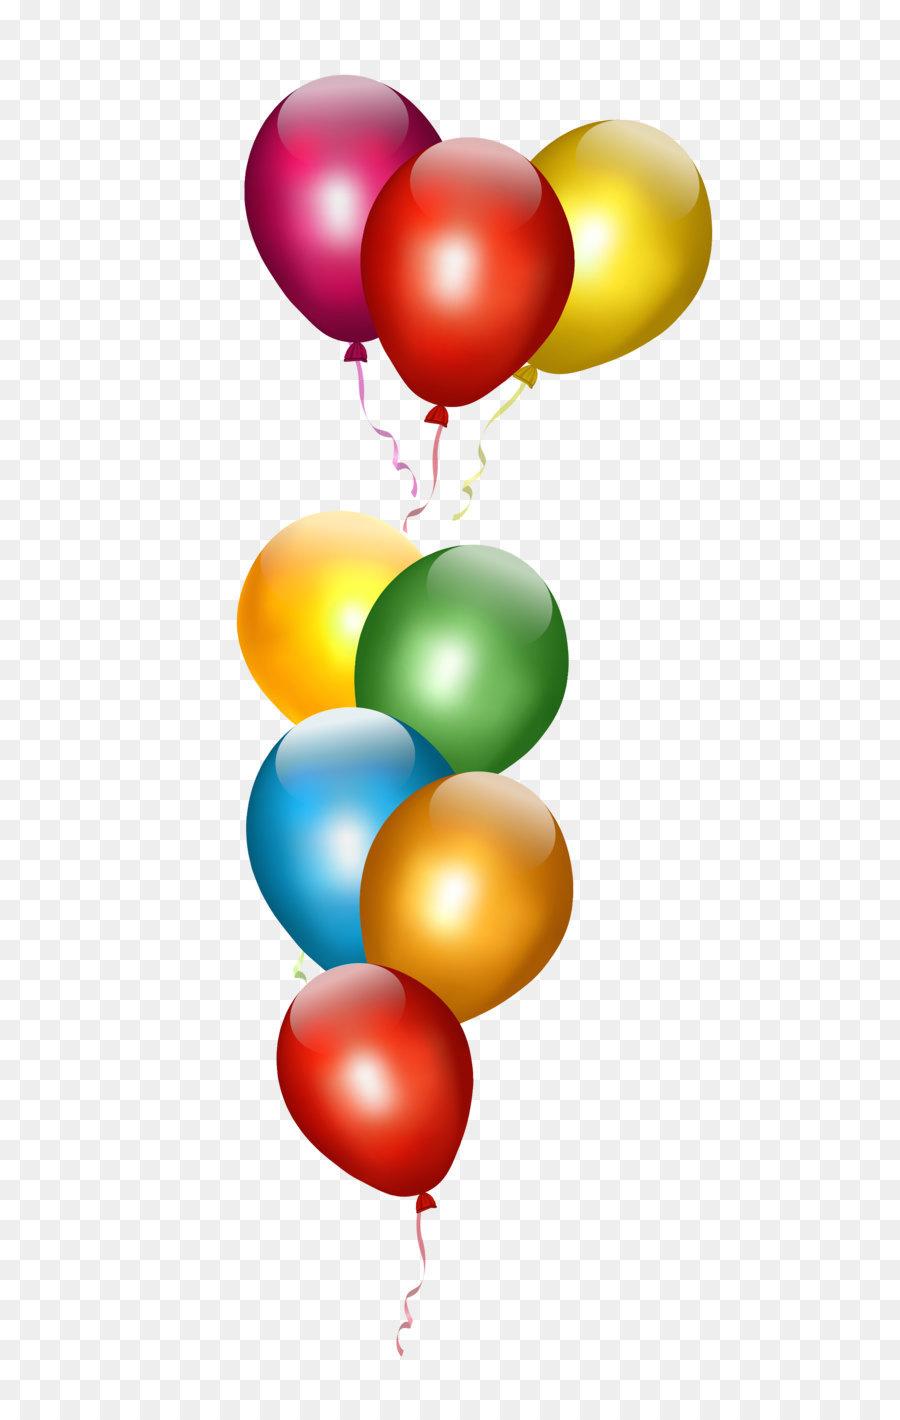 Party Toy Balloon Birthday Gift Transparent Balloons